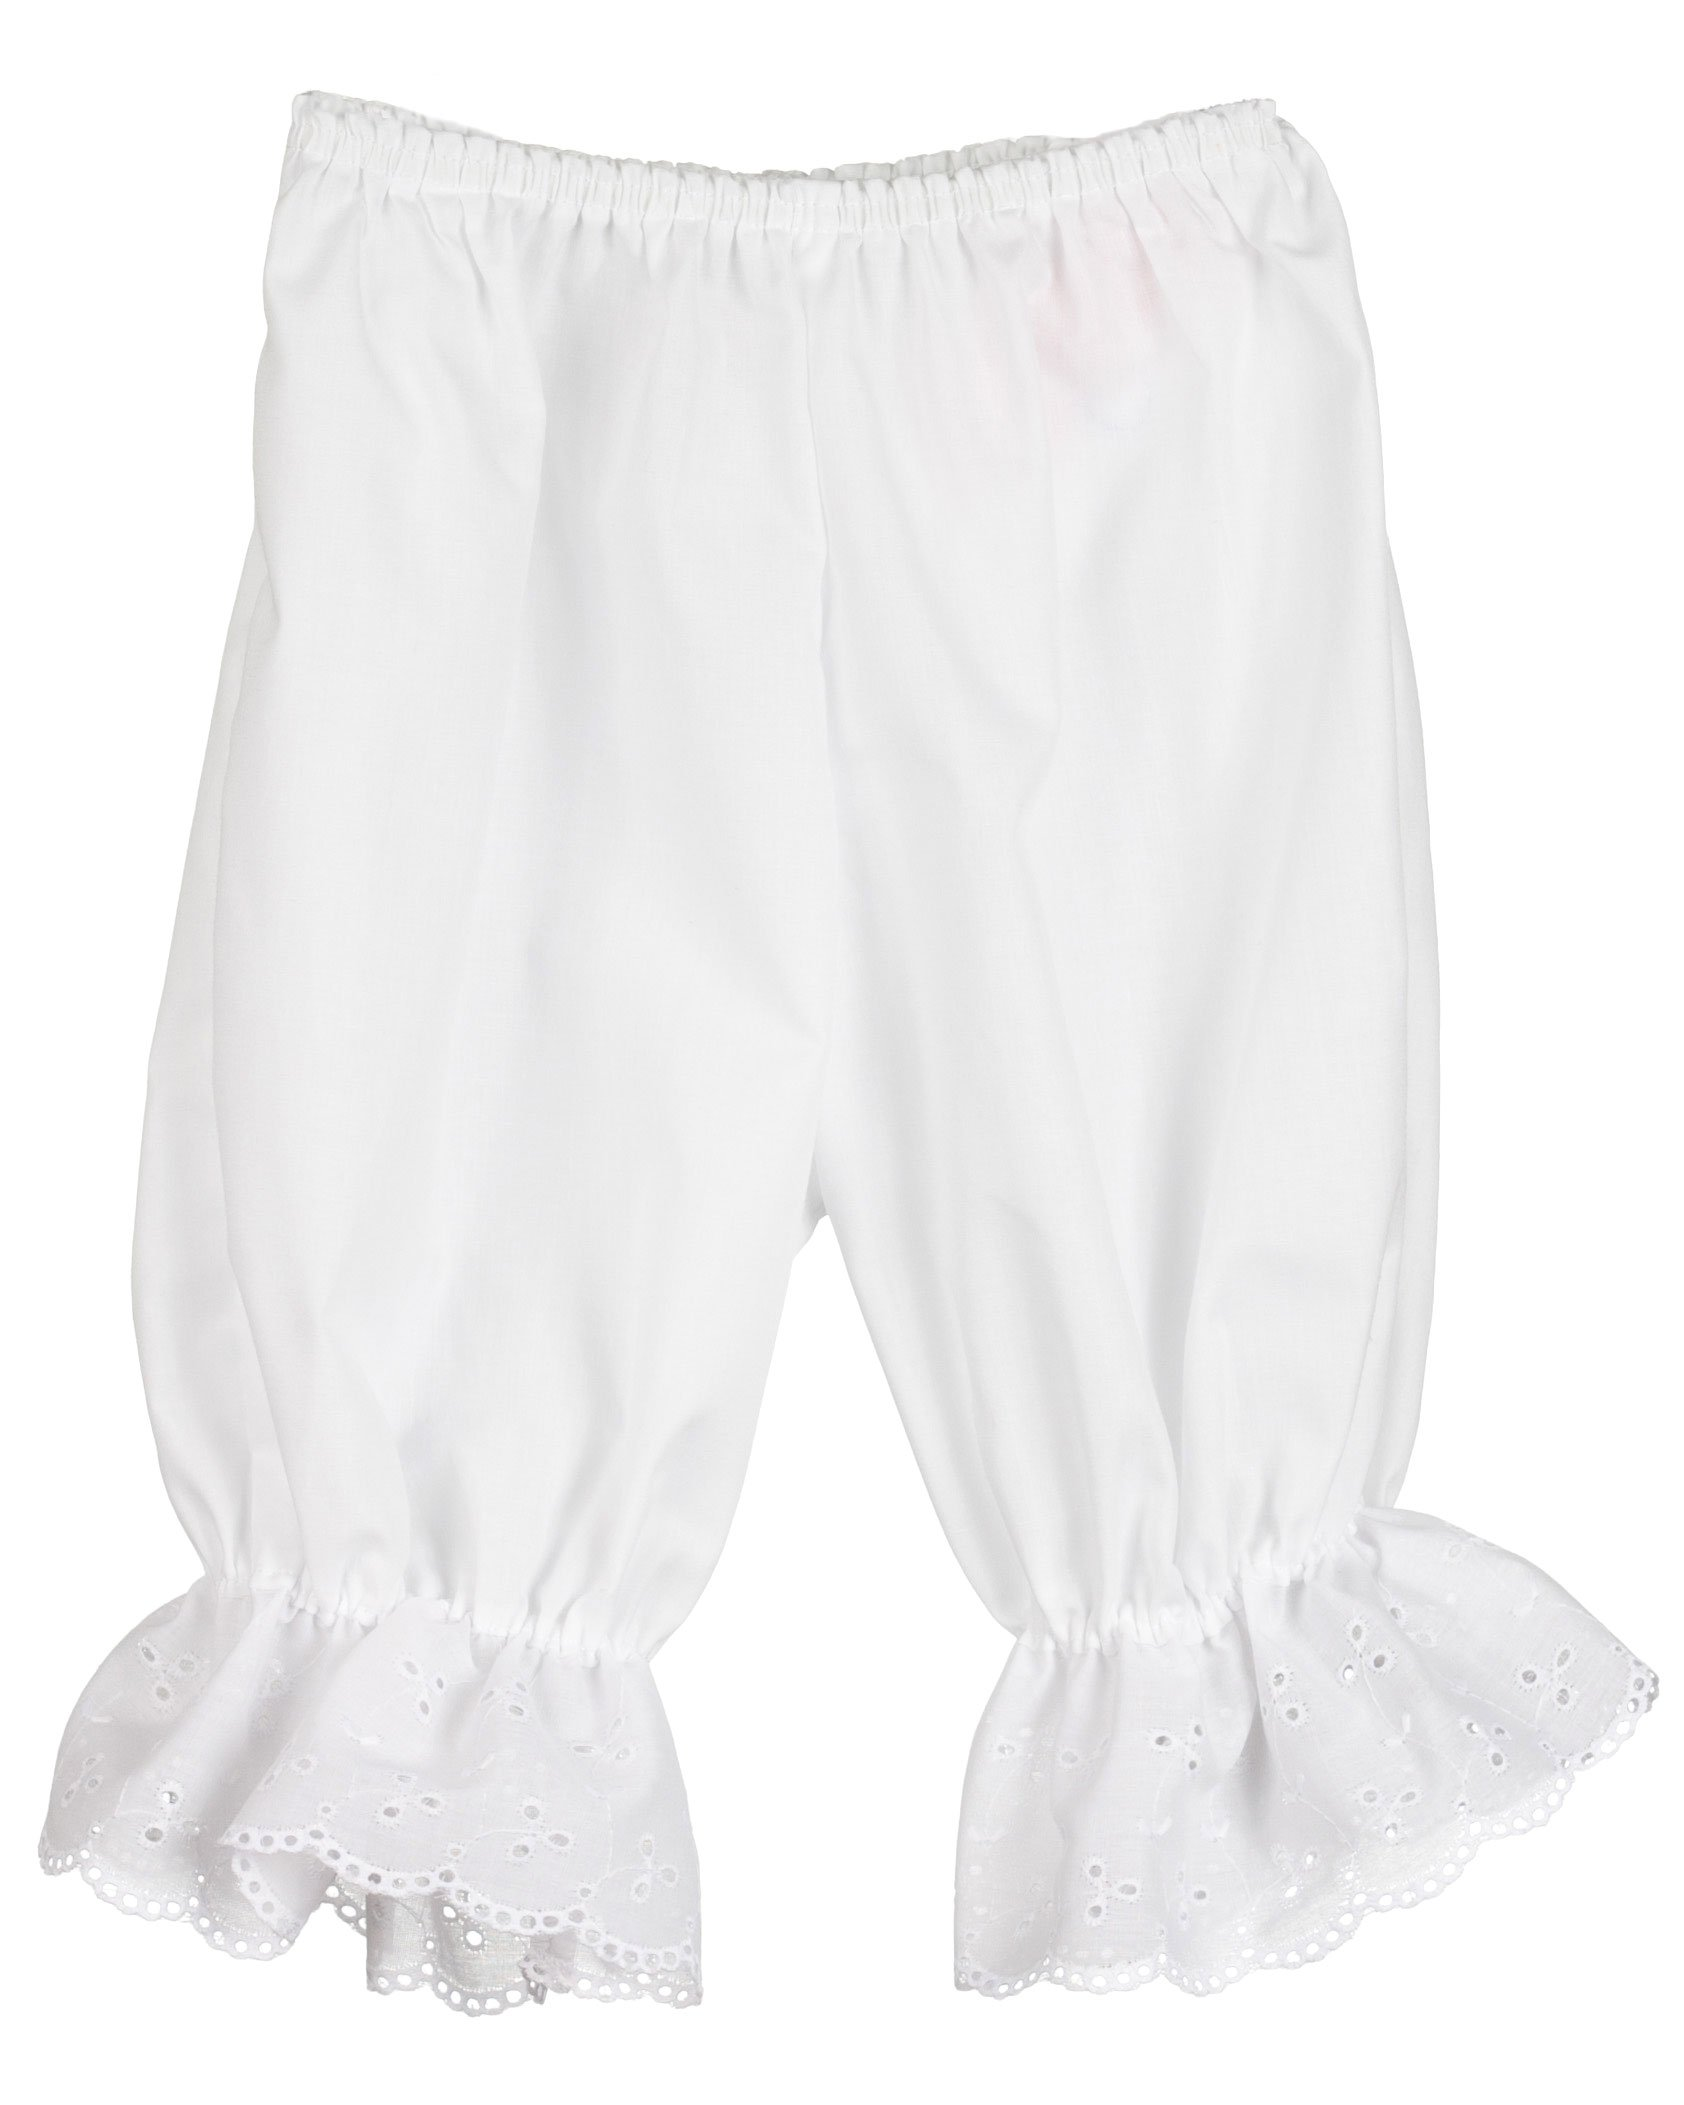 Little Zazzy Little Girls White Pantaloon Pettipants Bloomer Under-pants 3T